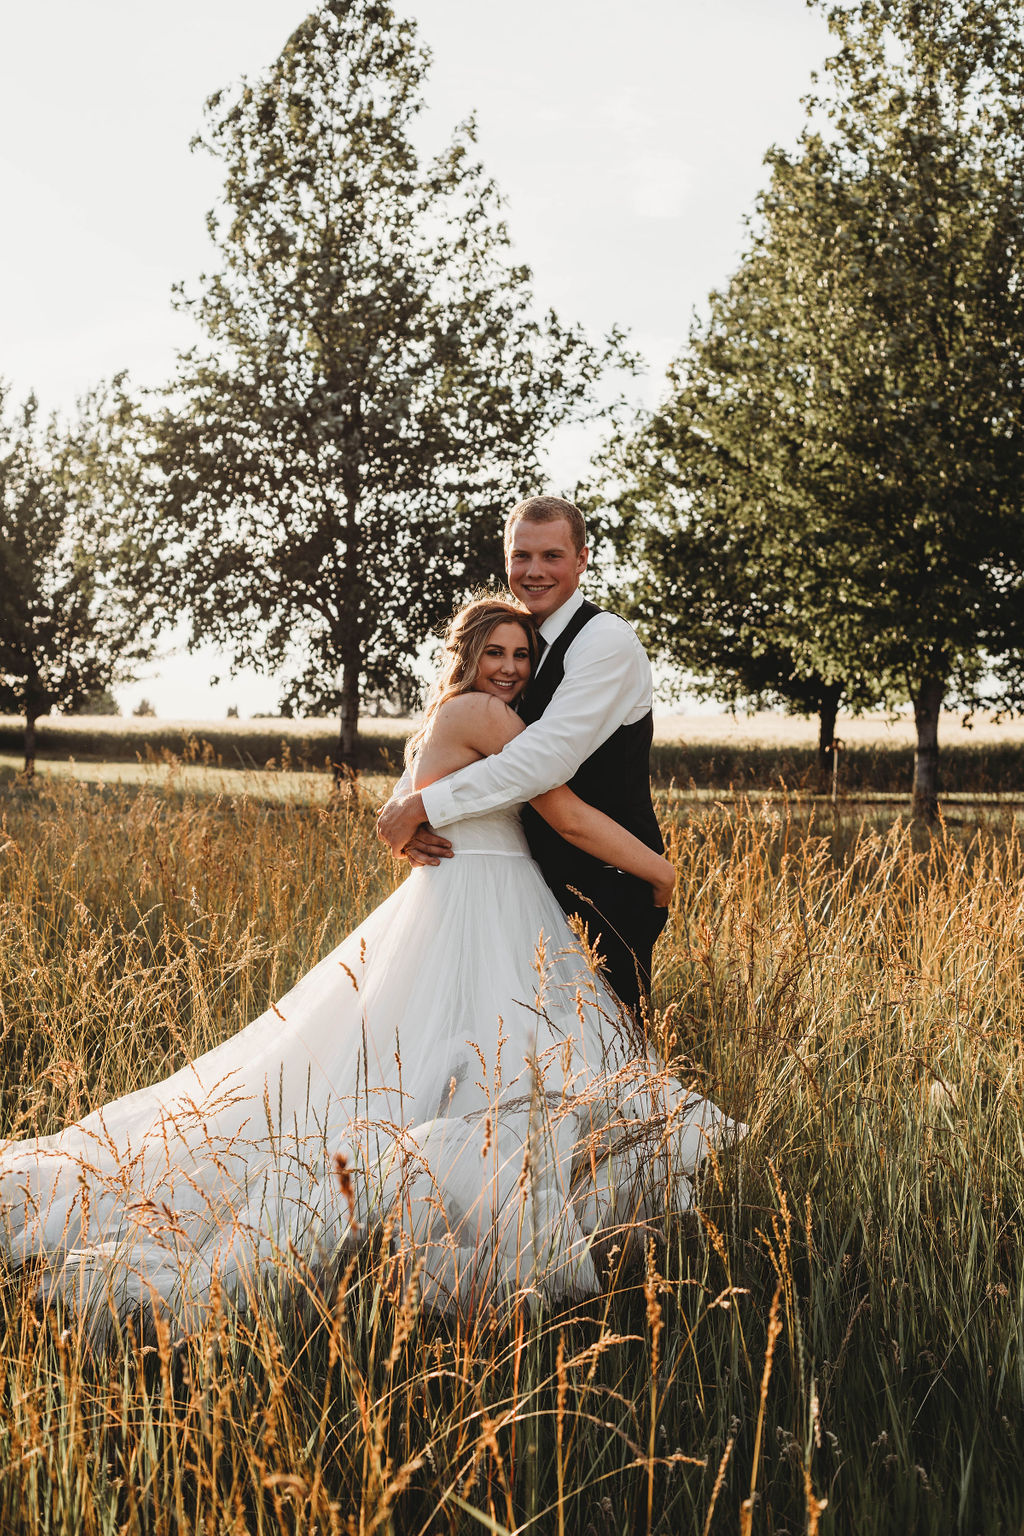 honest in ivory ballgown spokane wedding